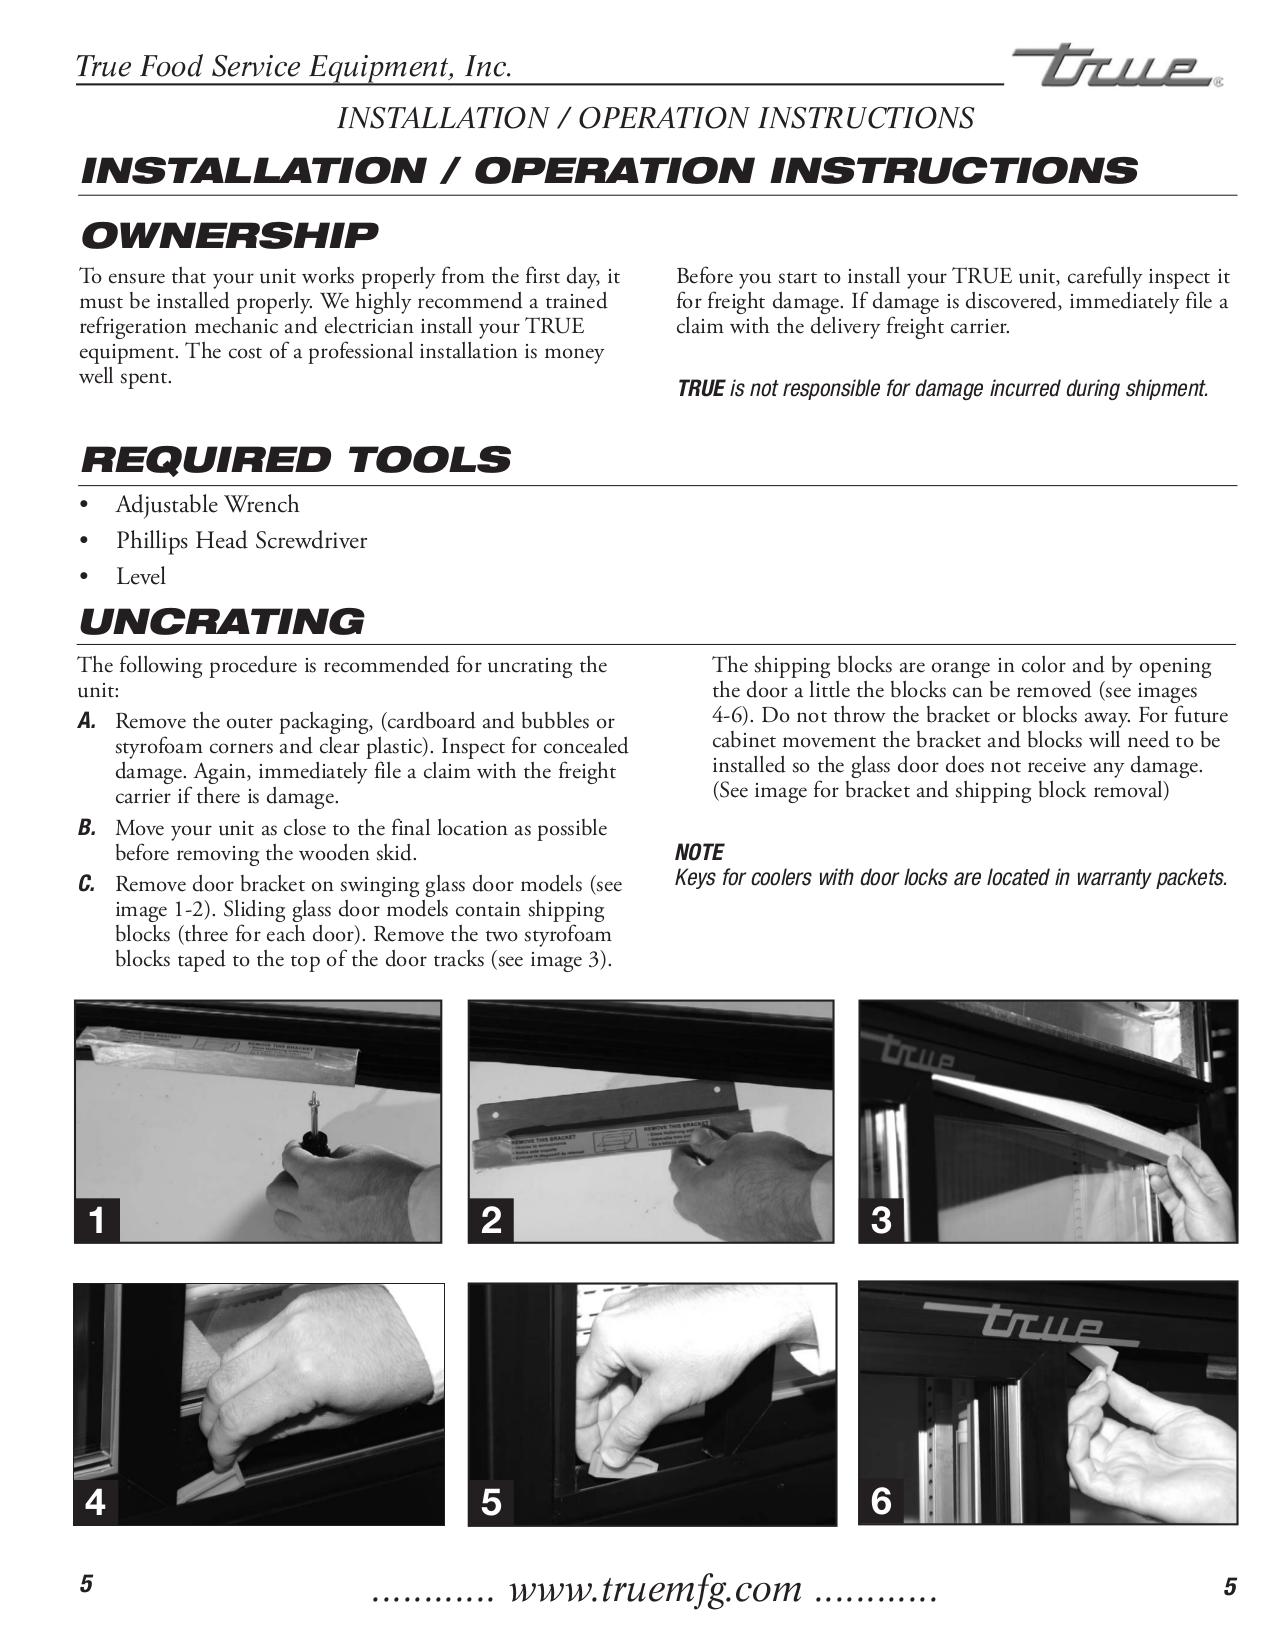 True Gdm 26 Manual